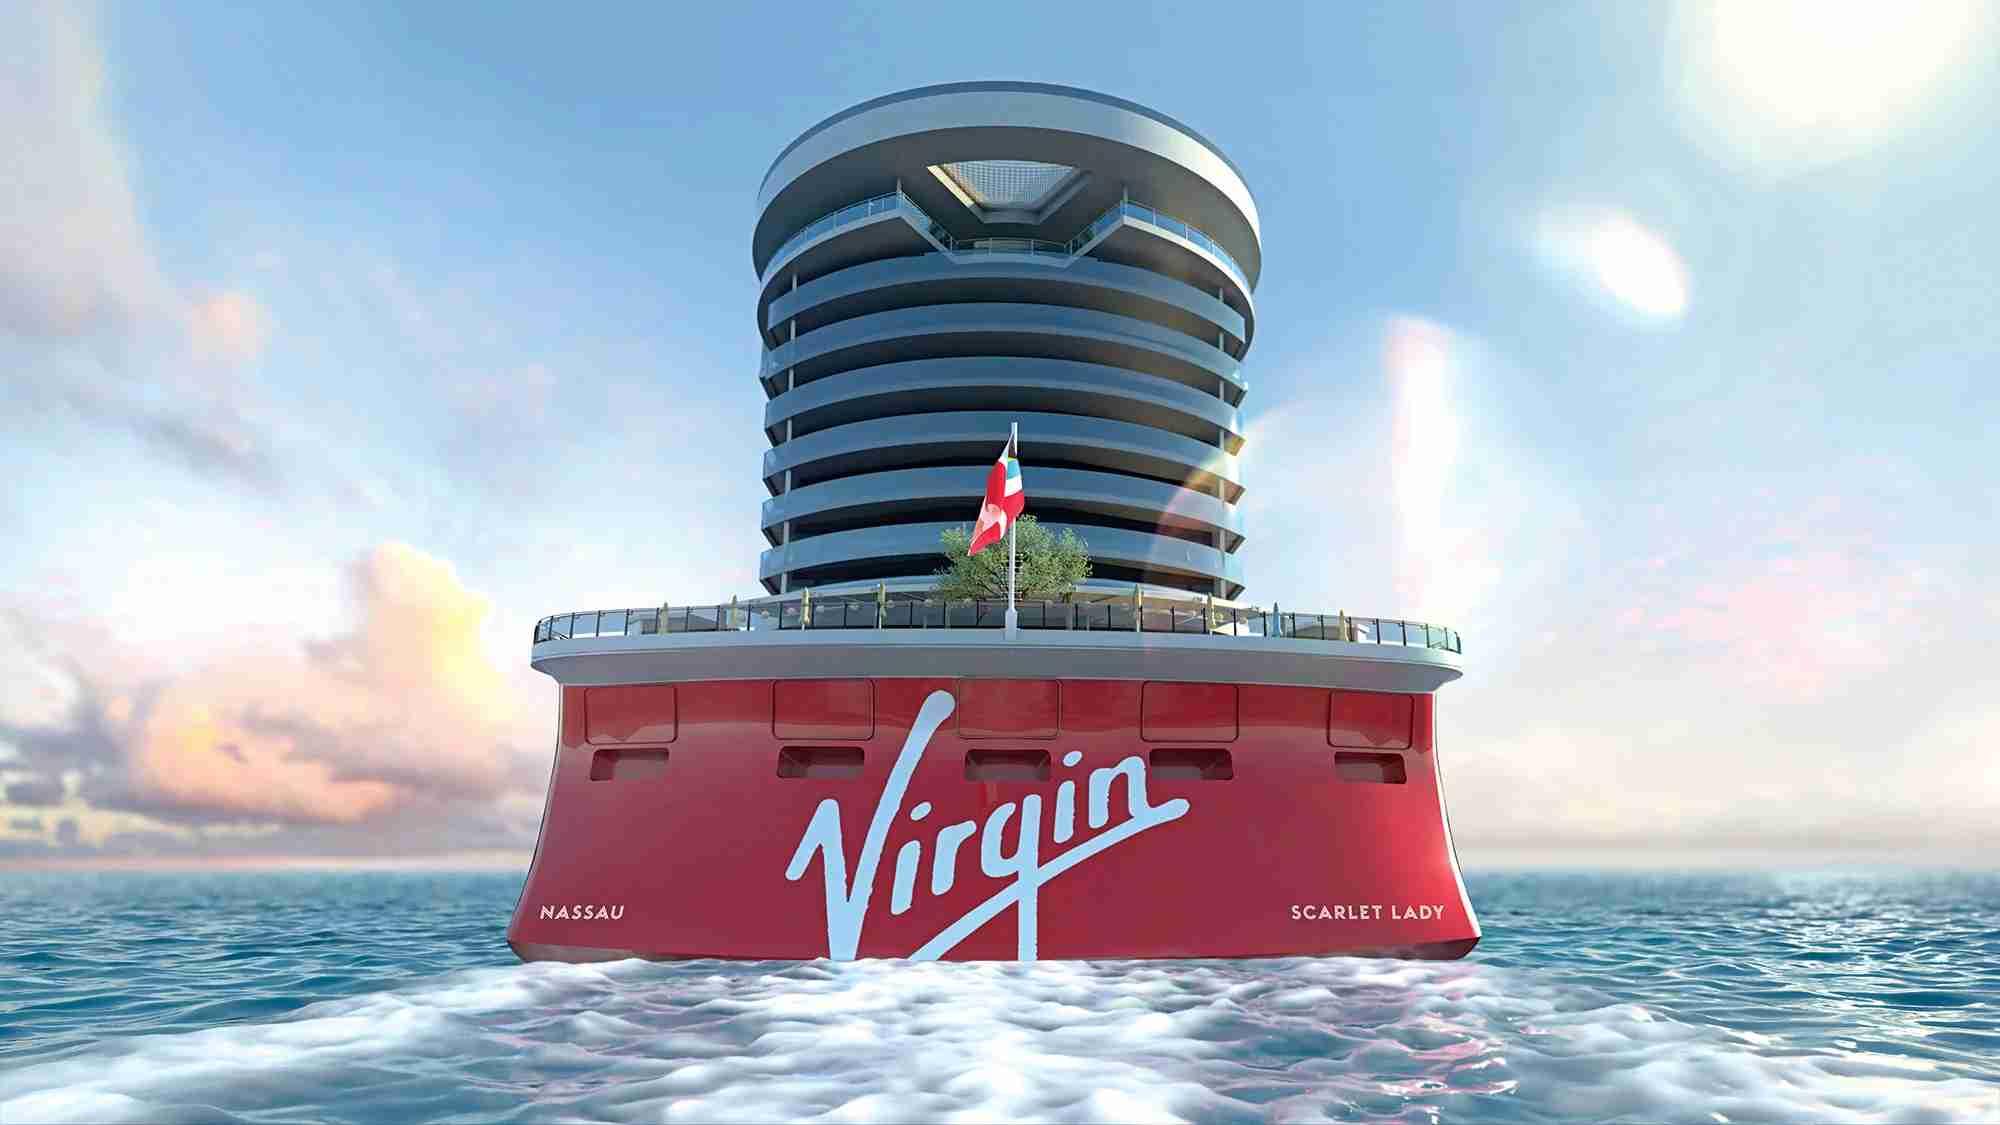 Image courtesy of Virgin Voyages